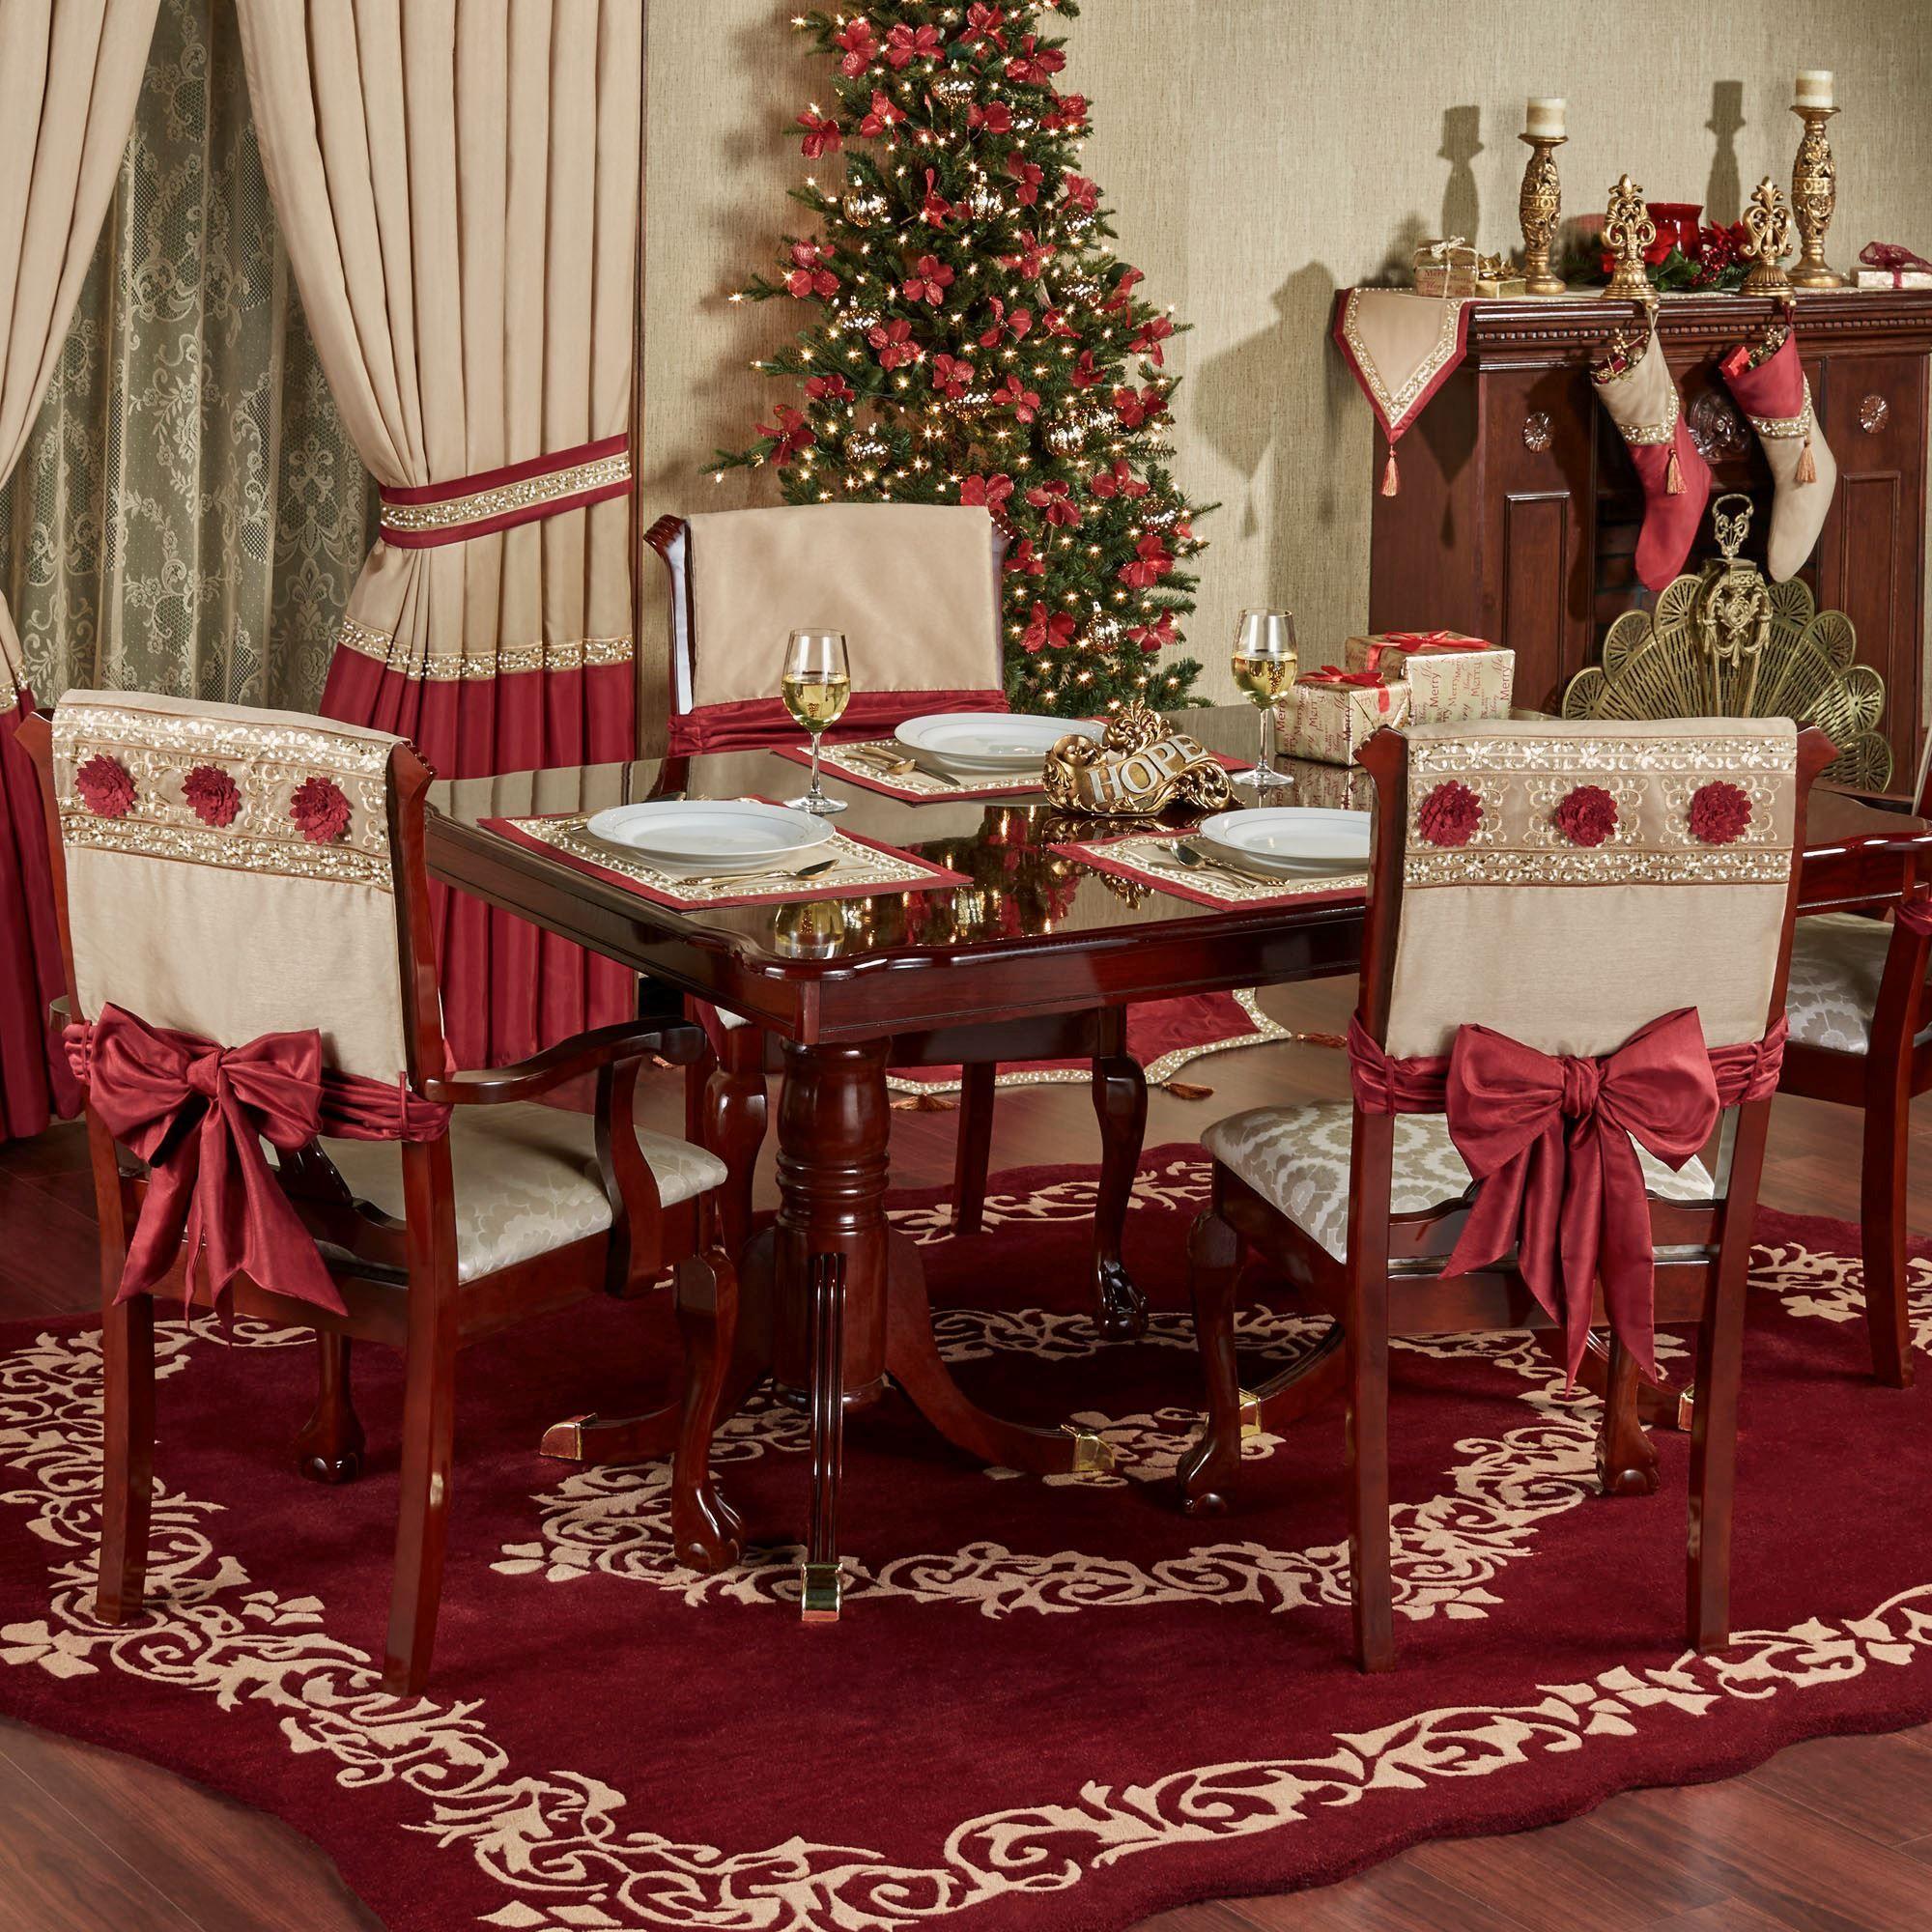 Prestige Chair Cover Set With Sash Ties Christmas Table Decorations Christmas Fireplace Decor White Christmas Decor